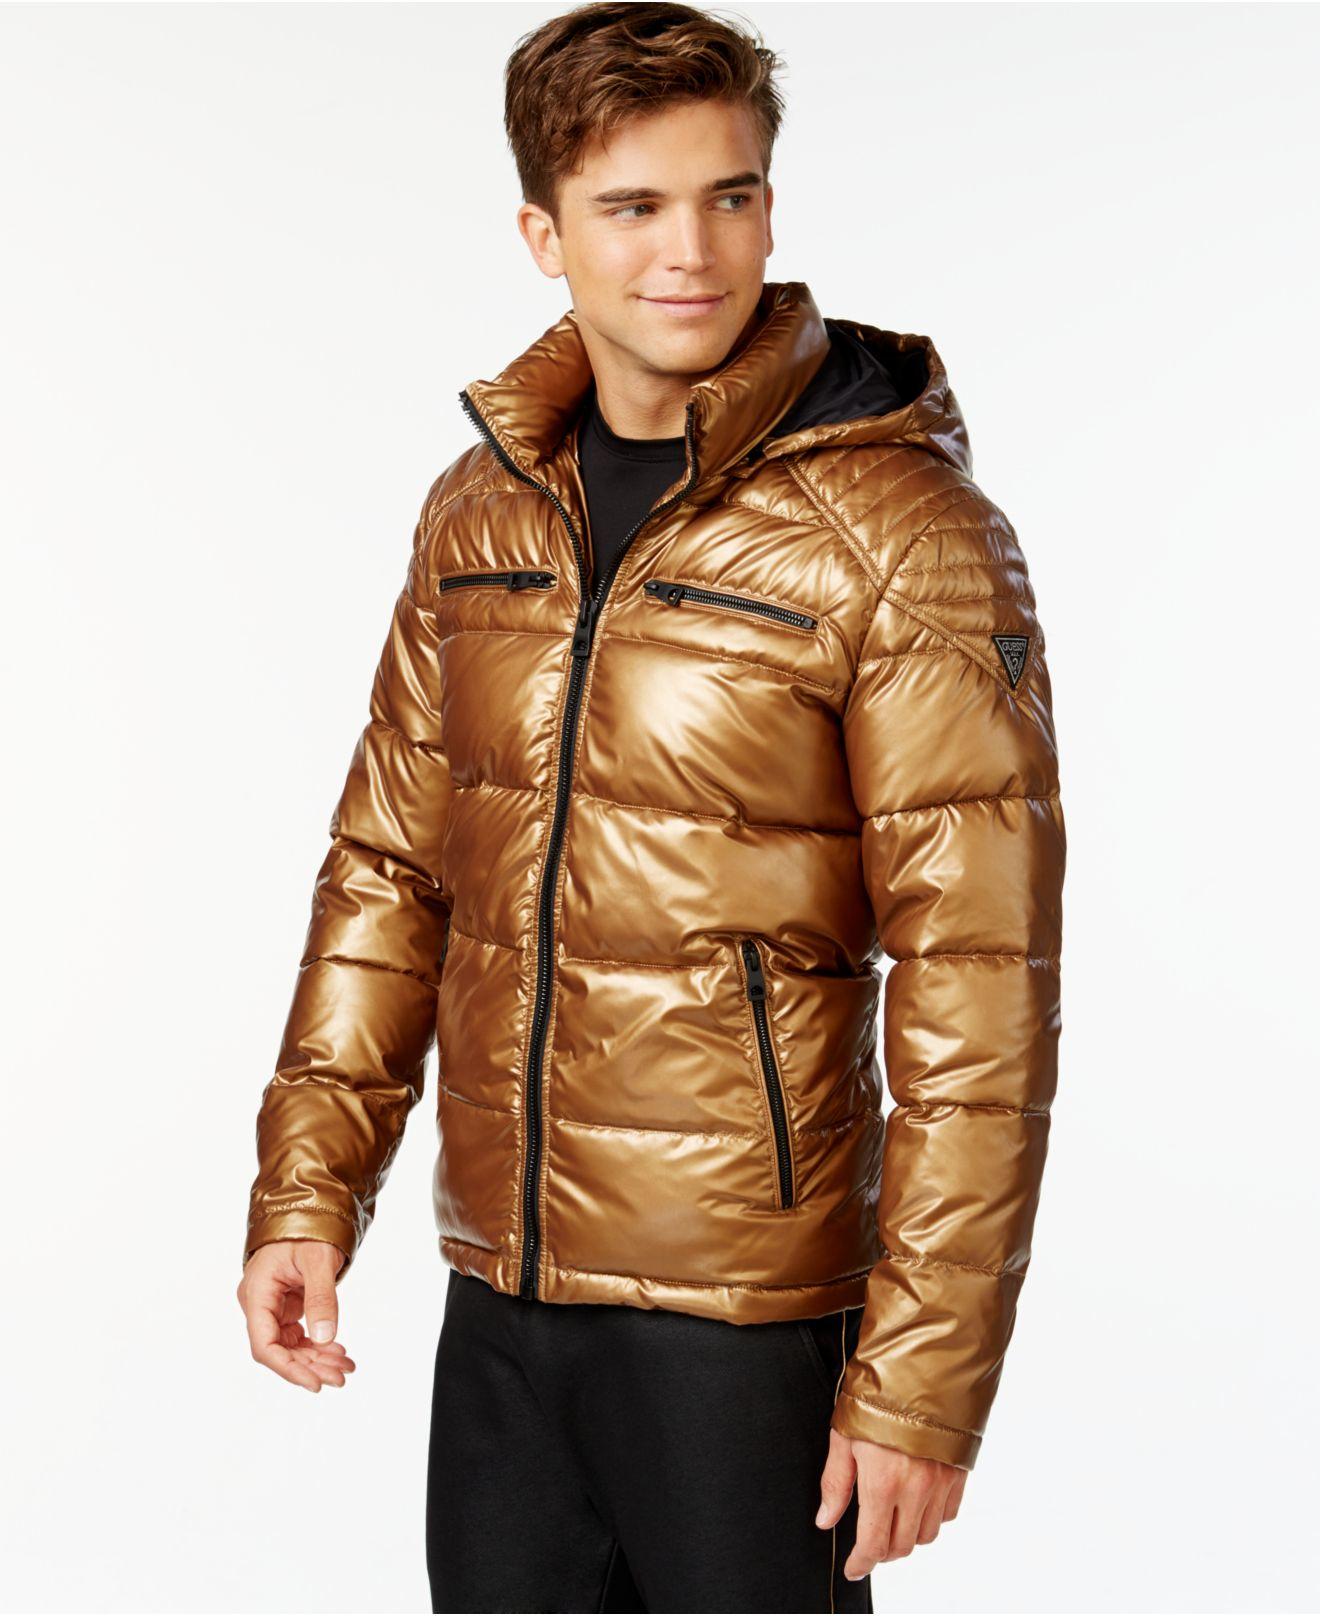 Hollister Fashion Puffer Jacket Mens